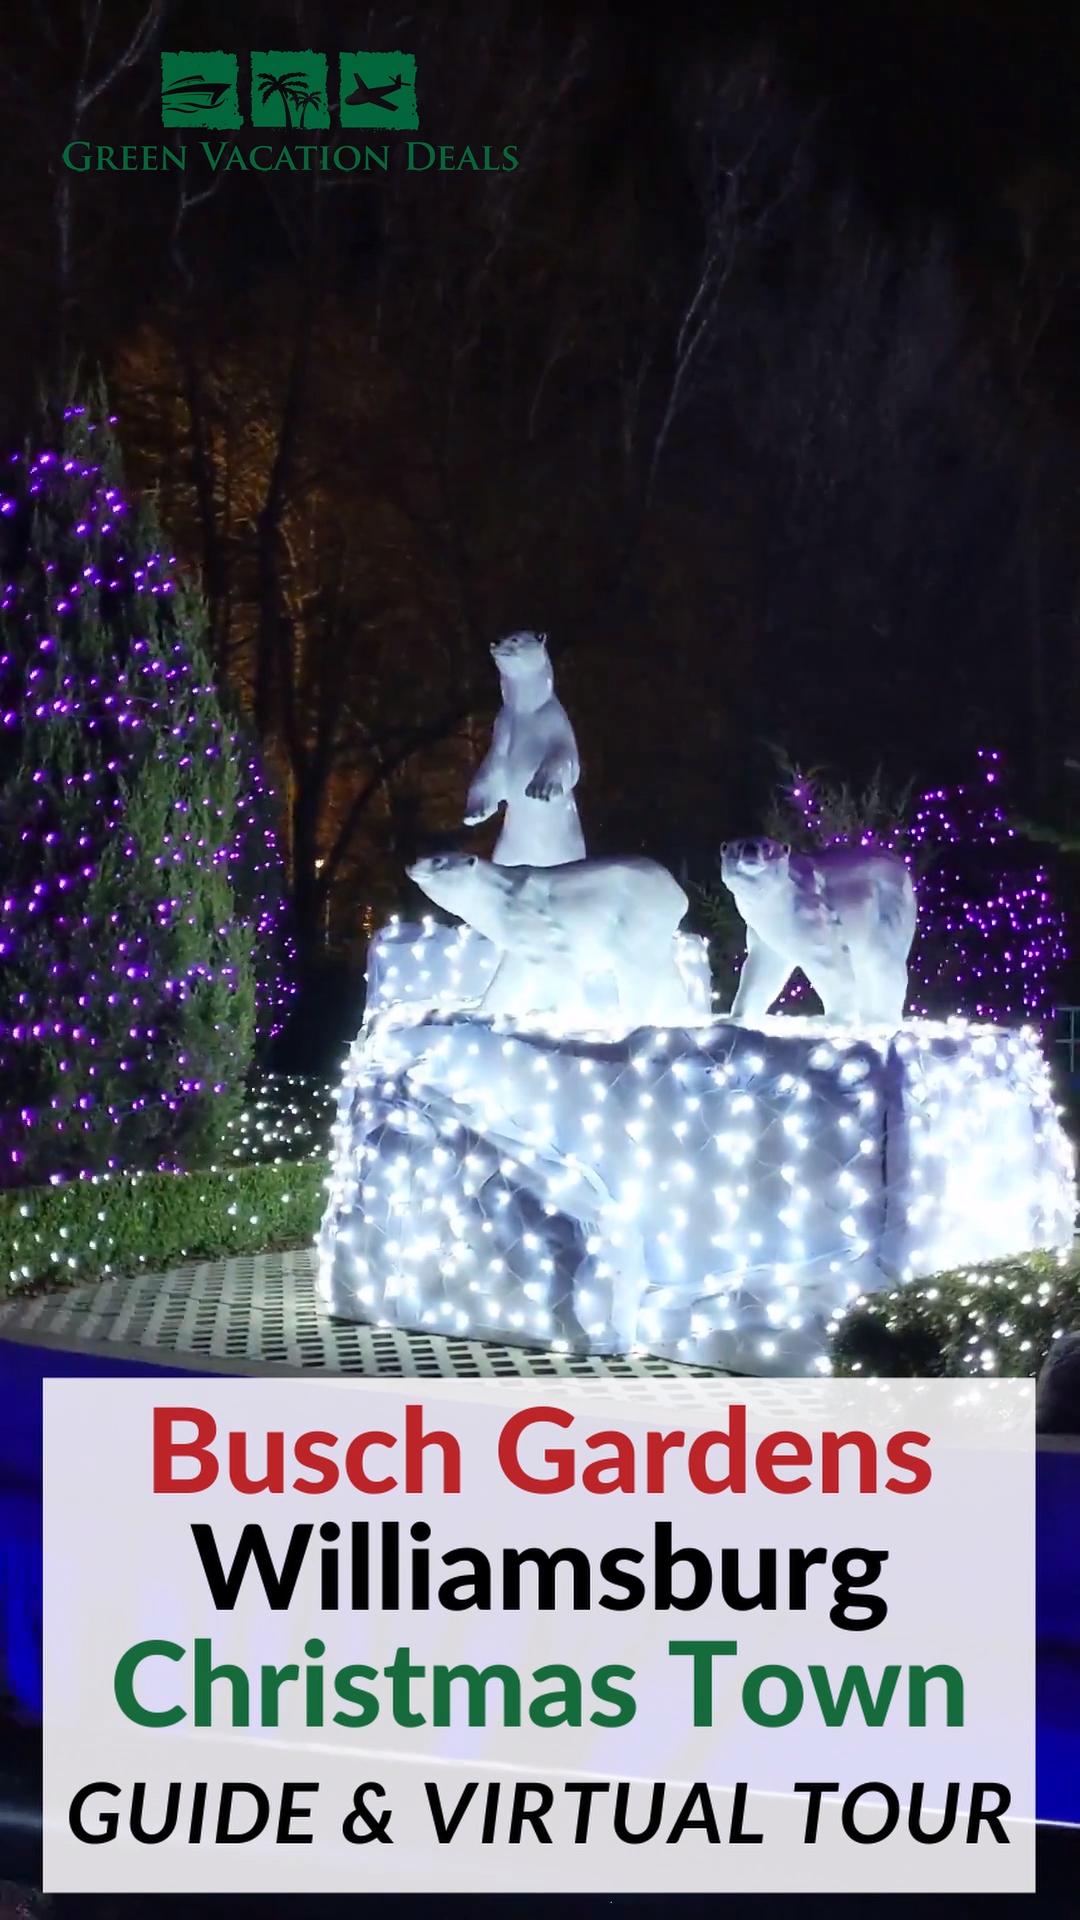 a532e30a6f862bb53e546e37f5297a81 - Busch Gardens Williamsburg Christmas Town Discount Tickets 2019